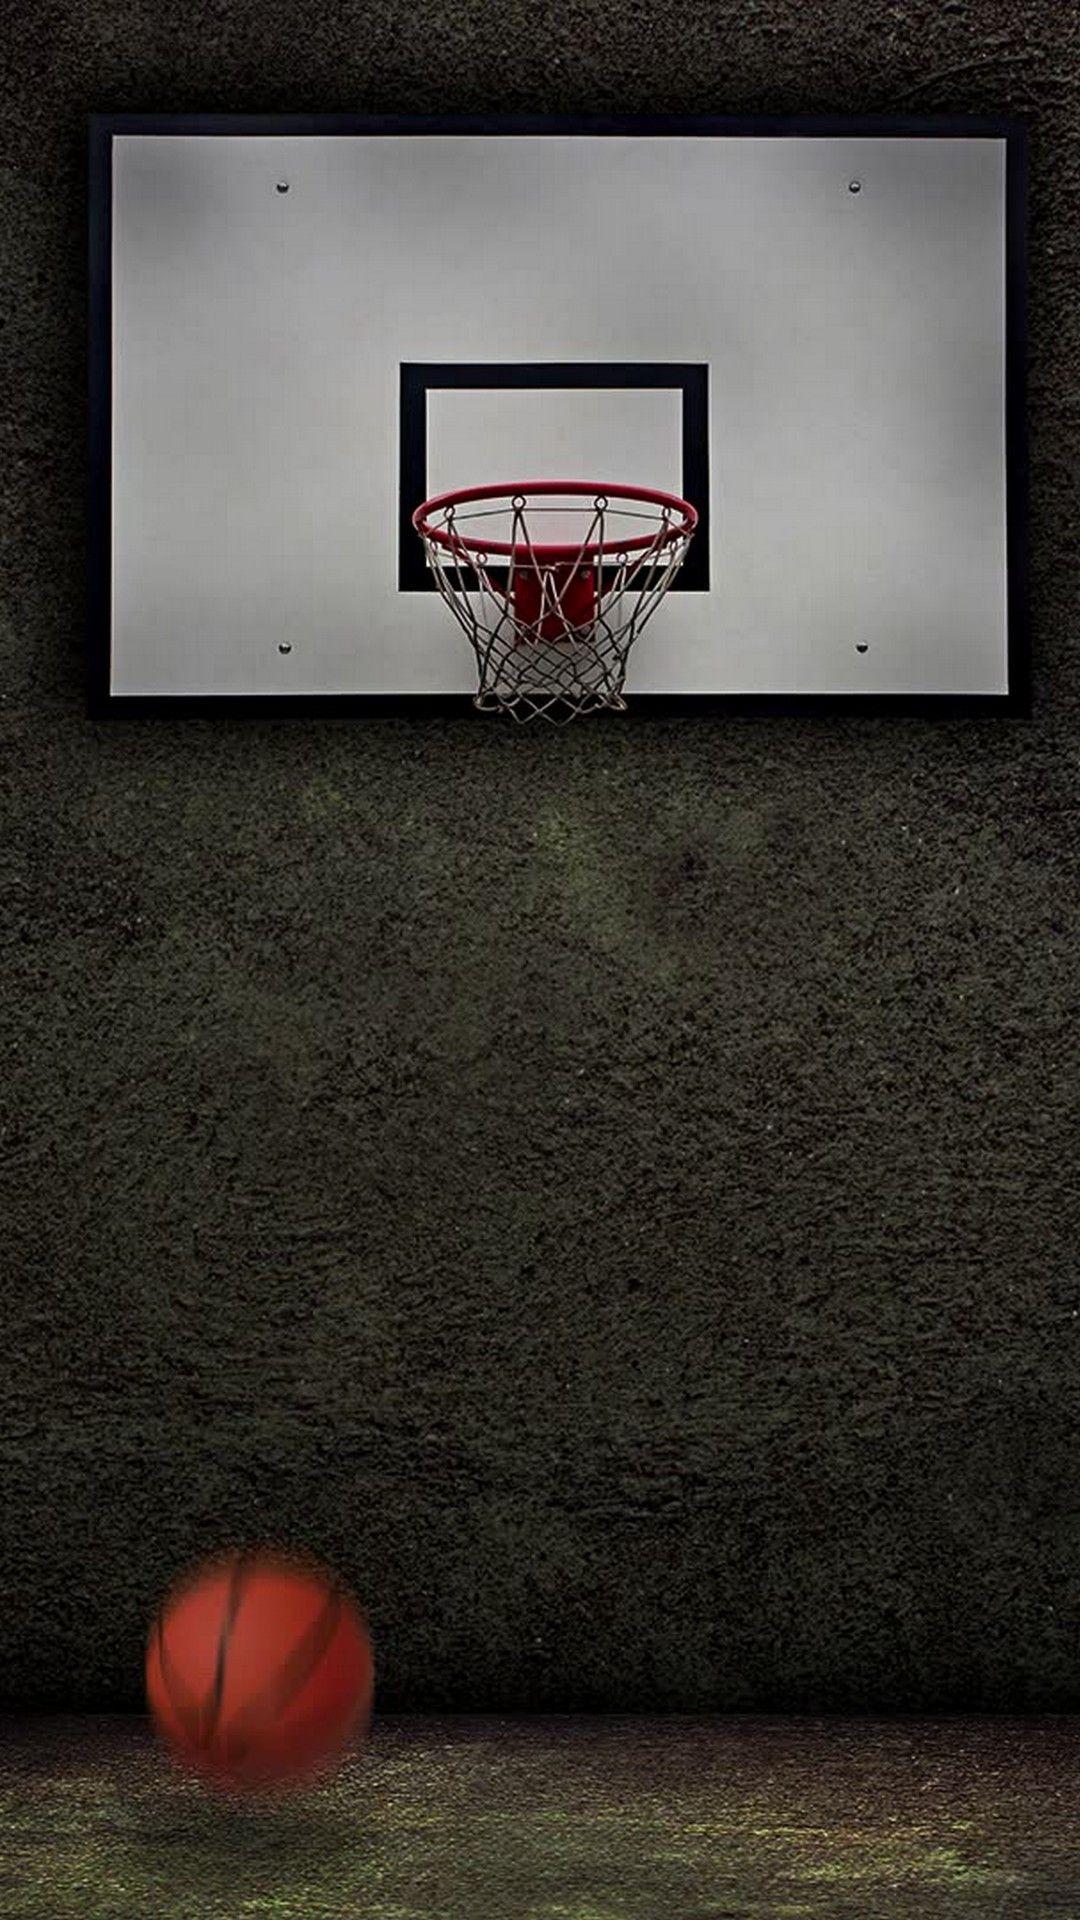 NBA Basketball Wallpaper iPhone HD 2020 Basketball